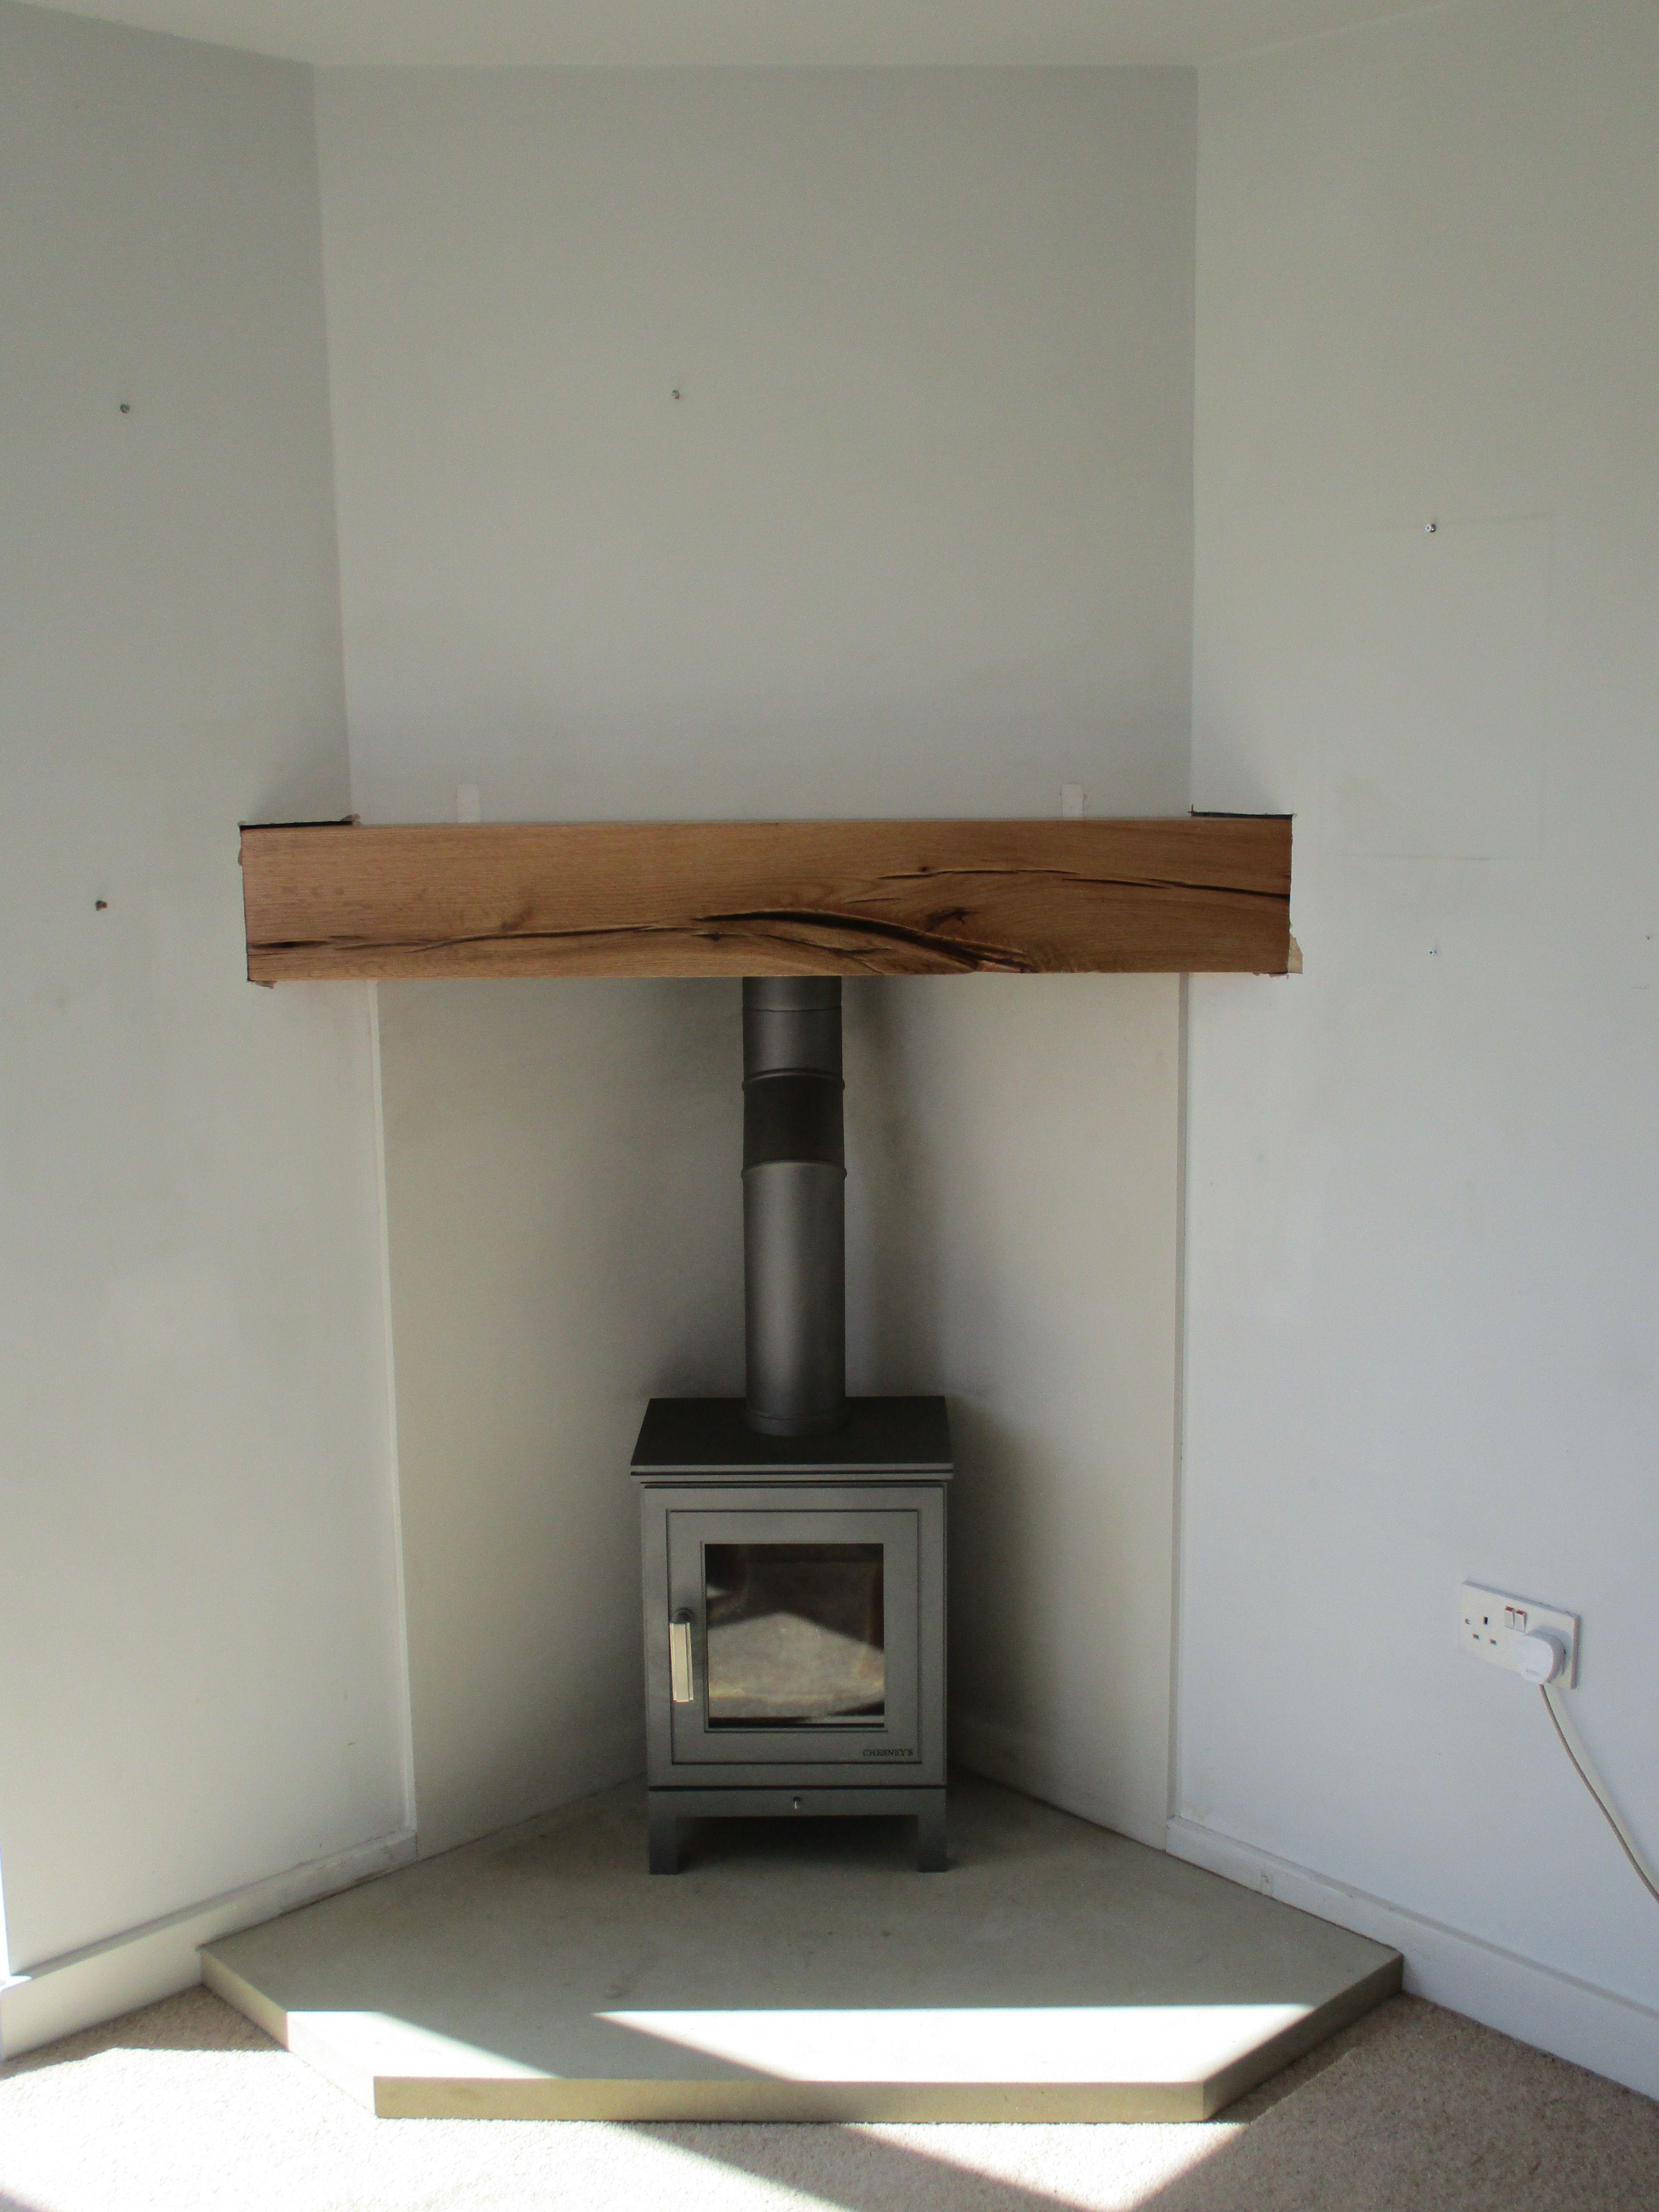 Woodburningstove living room pinterest wood burning stove